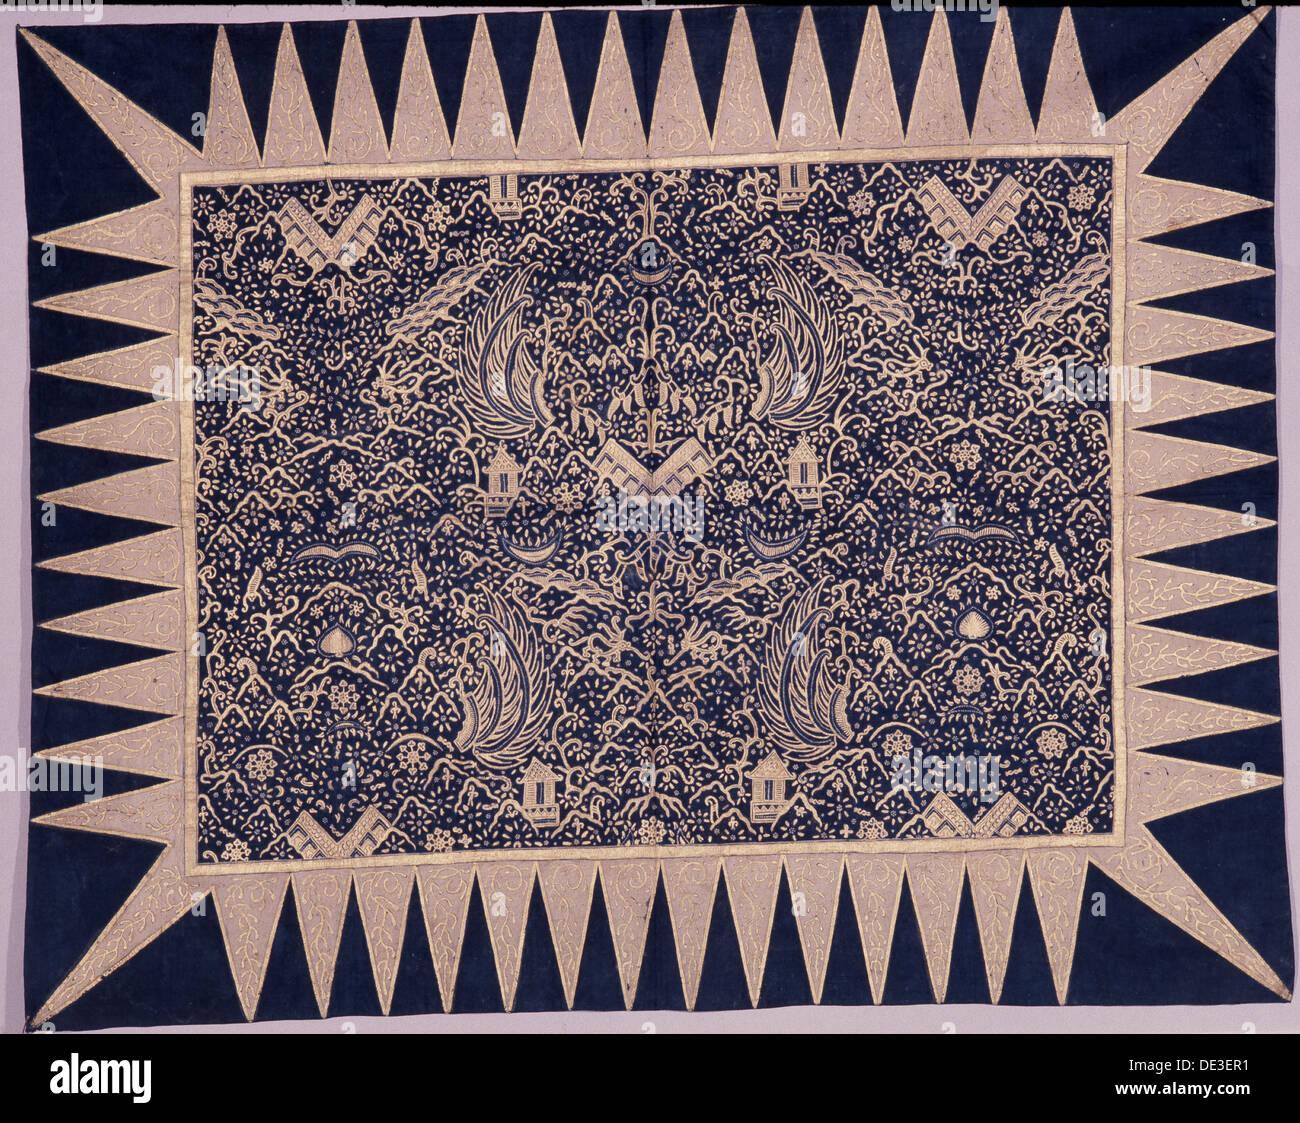 A batik kain depicting stylised wings, shrines and sacred mountains. - Stock Image